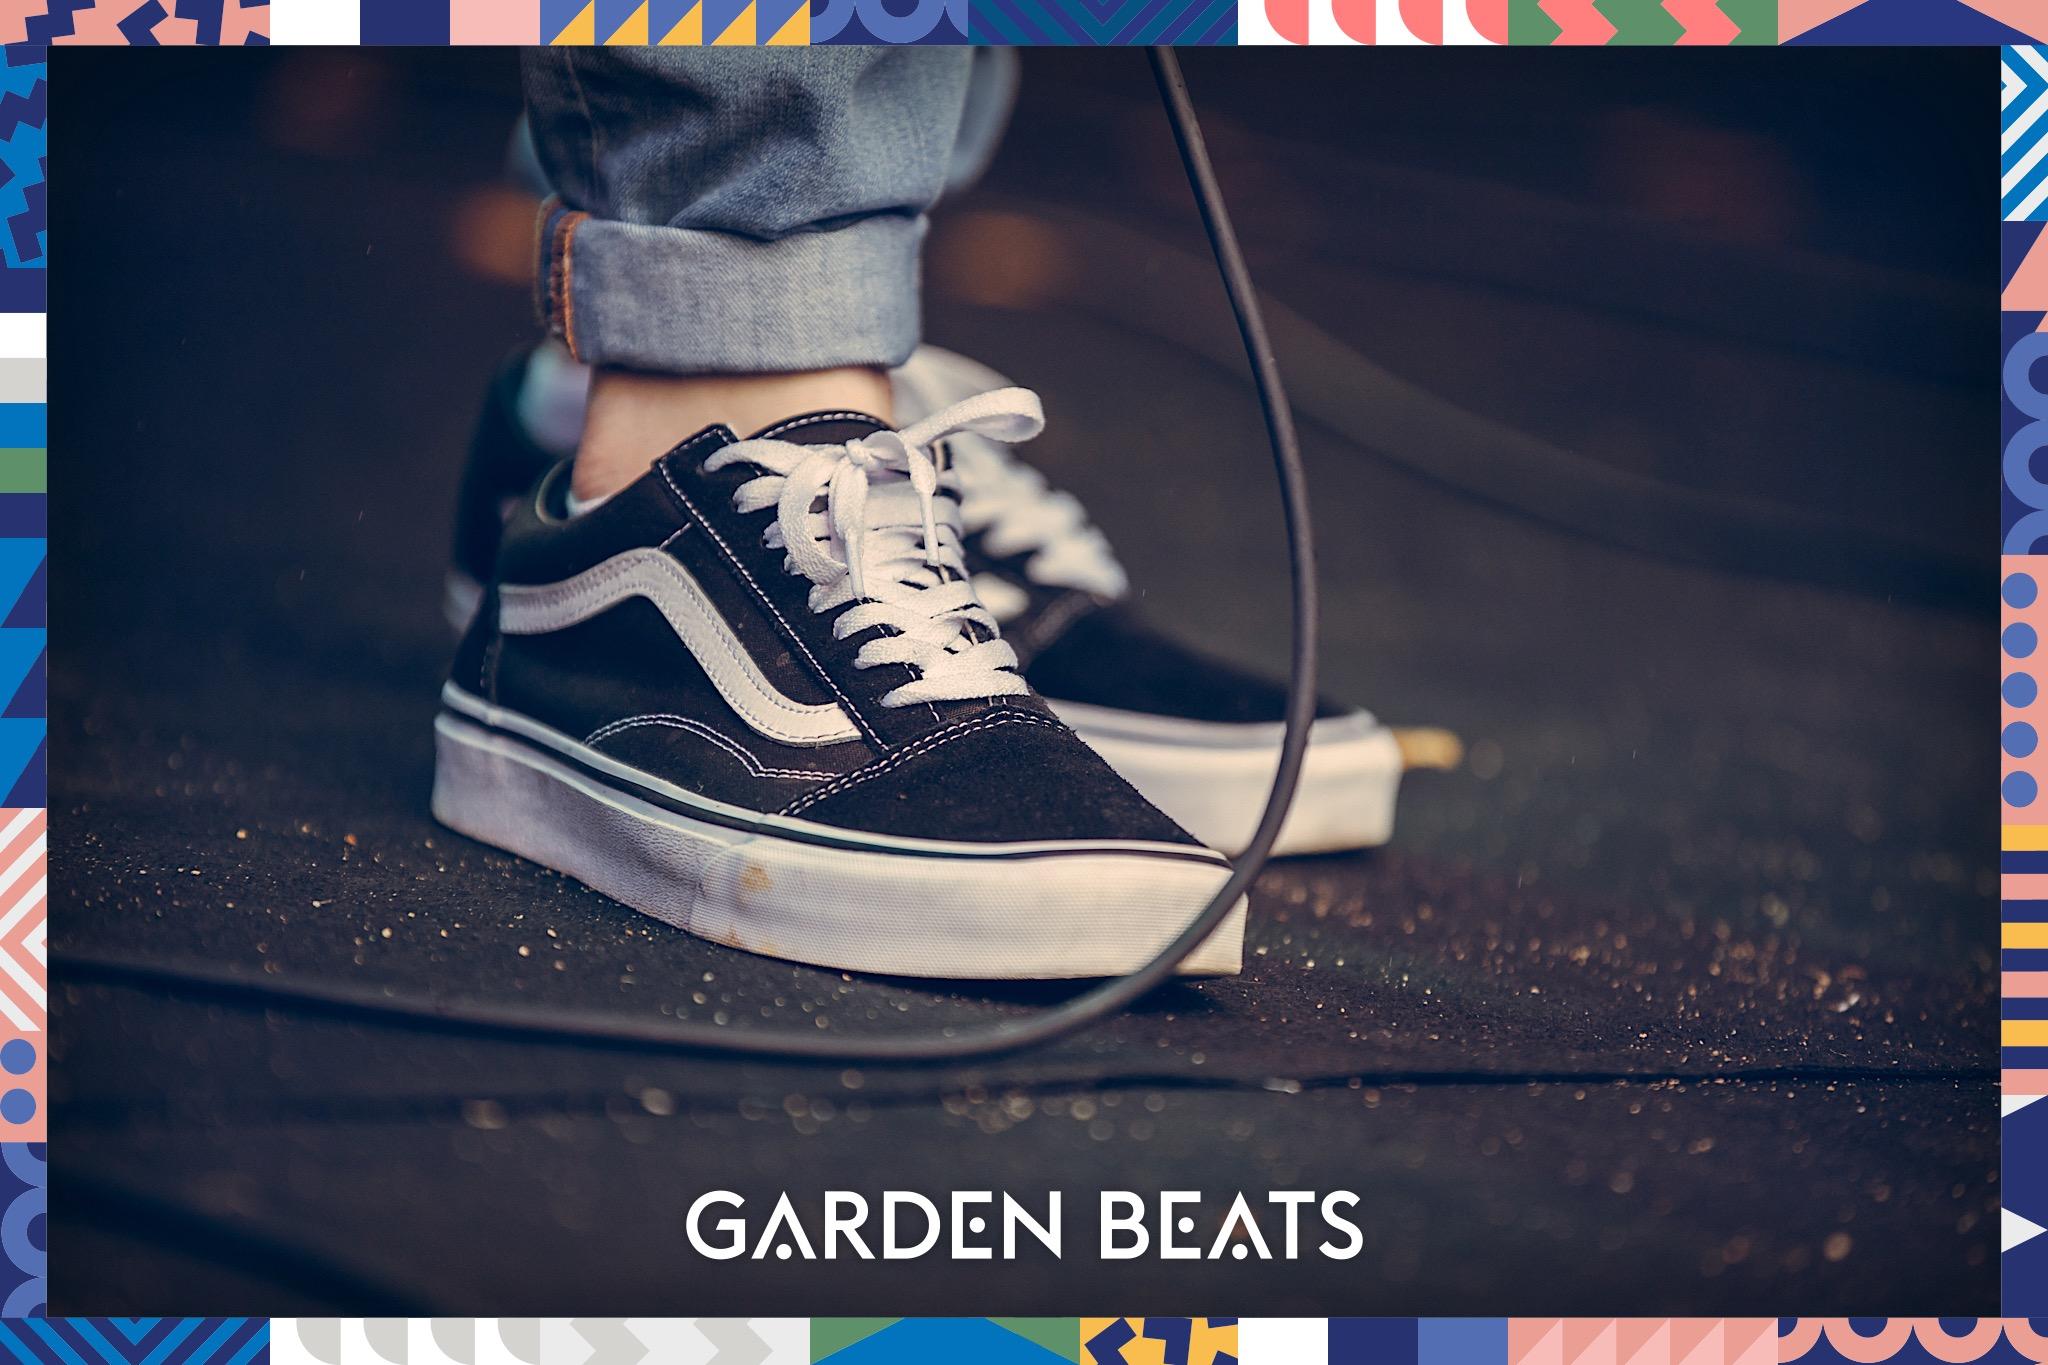 03032018_GardenBeats_Colossal530_Watermarked.jpg